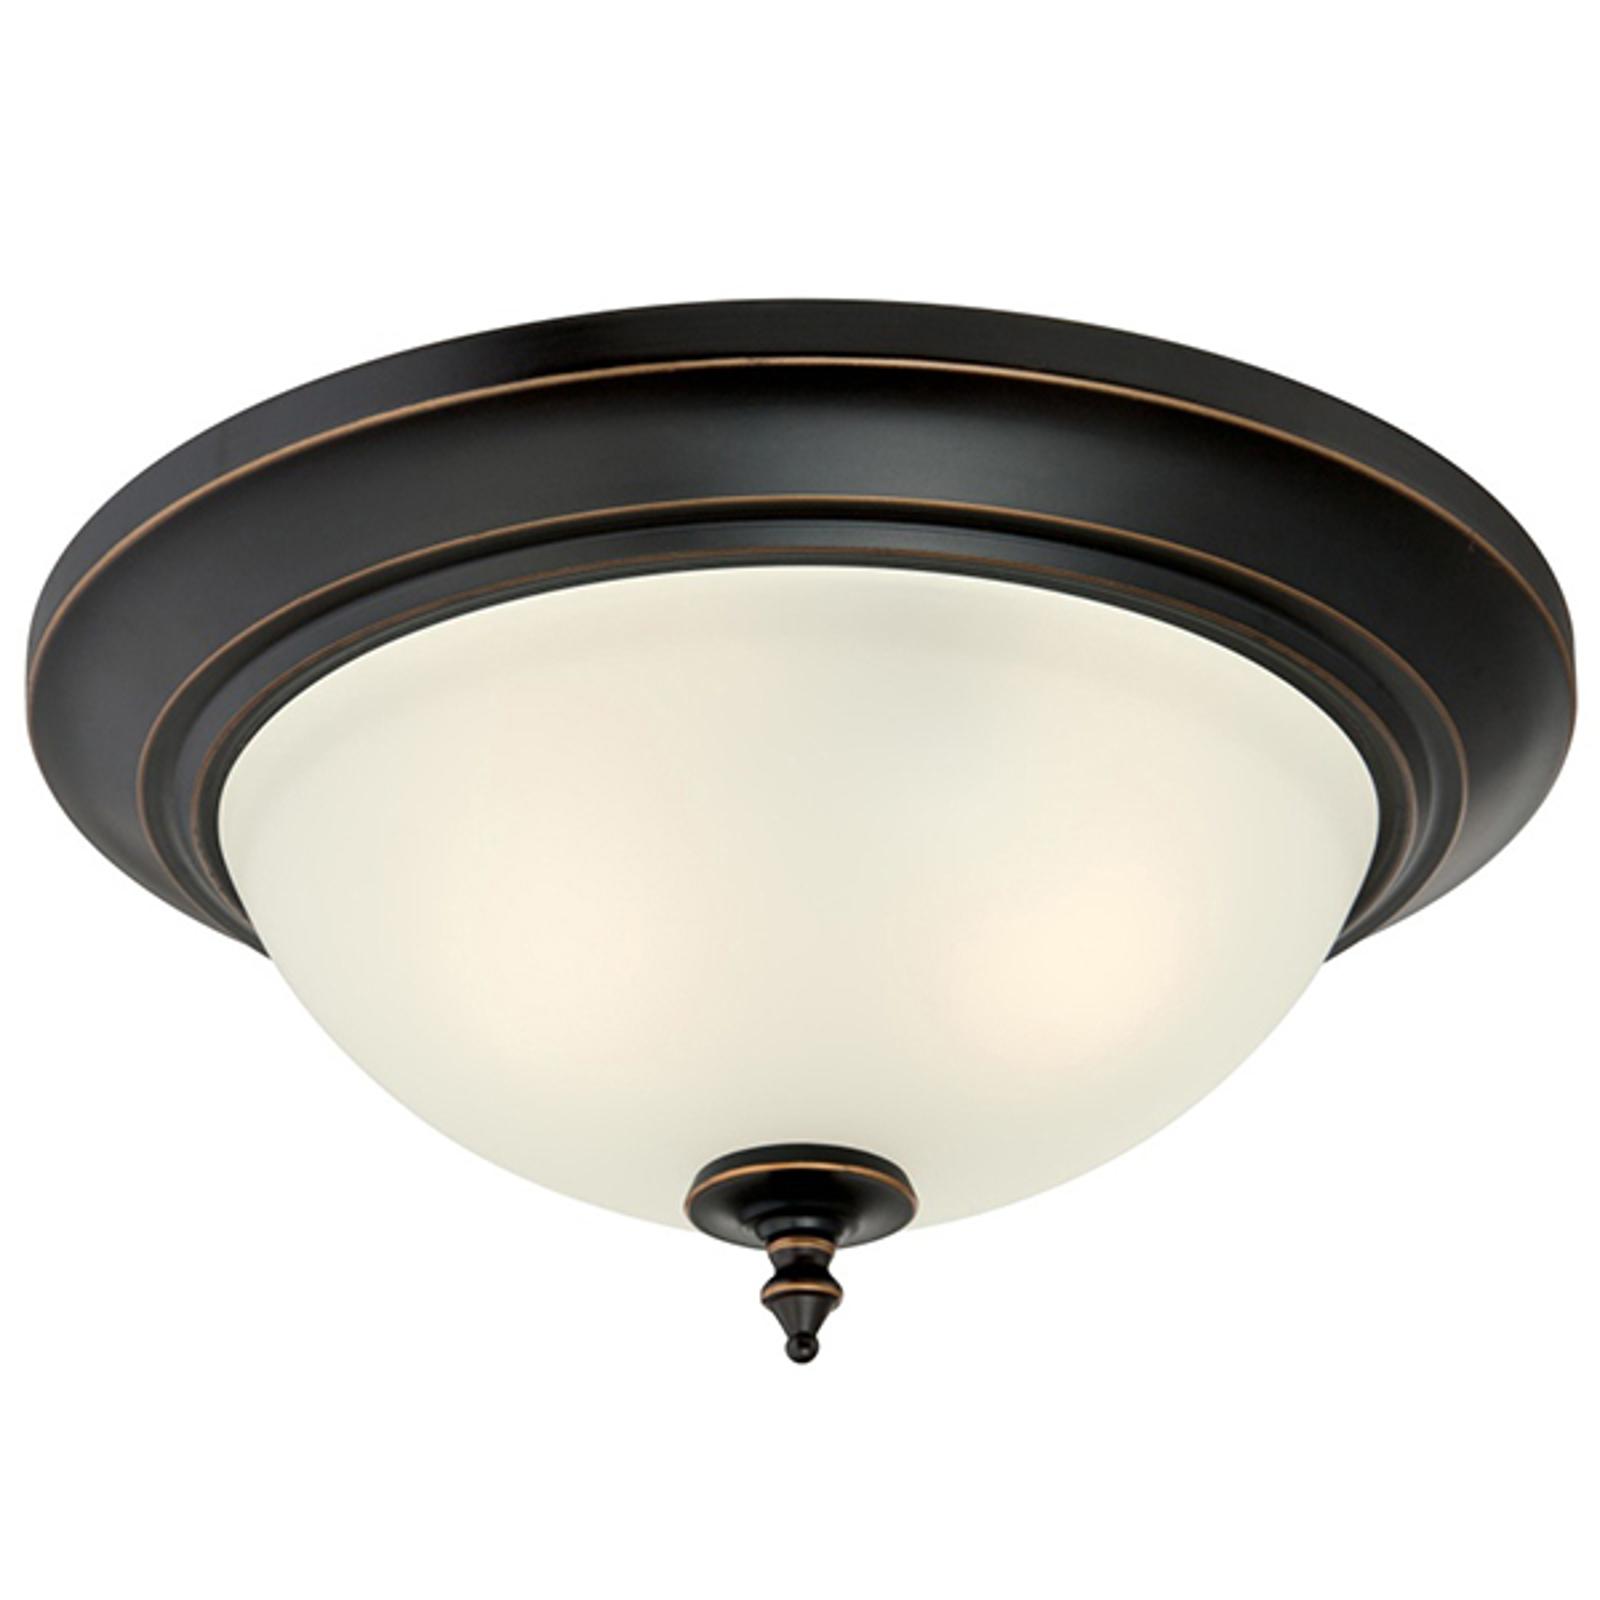 Westinghouse Harwell lampa sufitowa, brąz